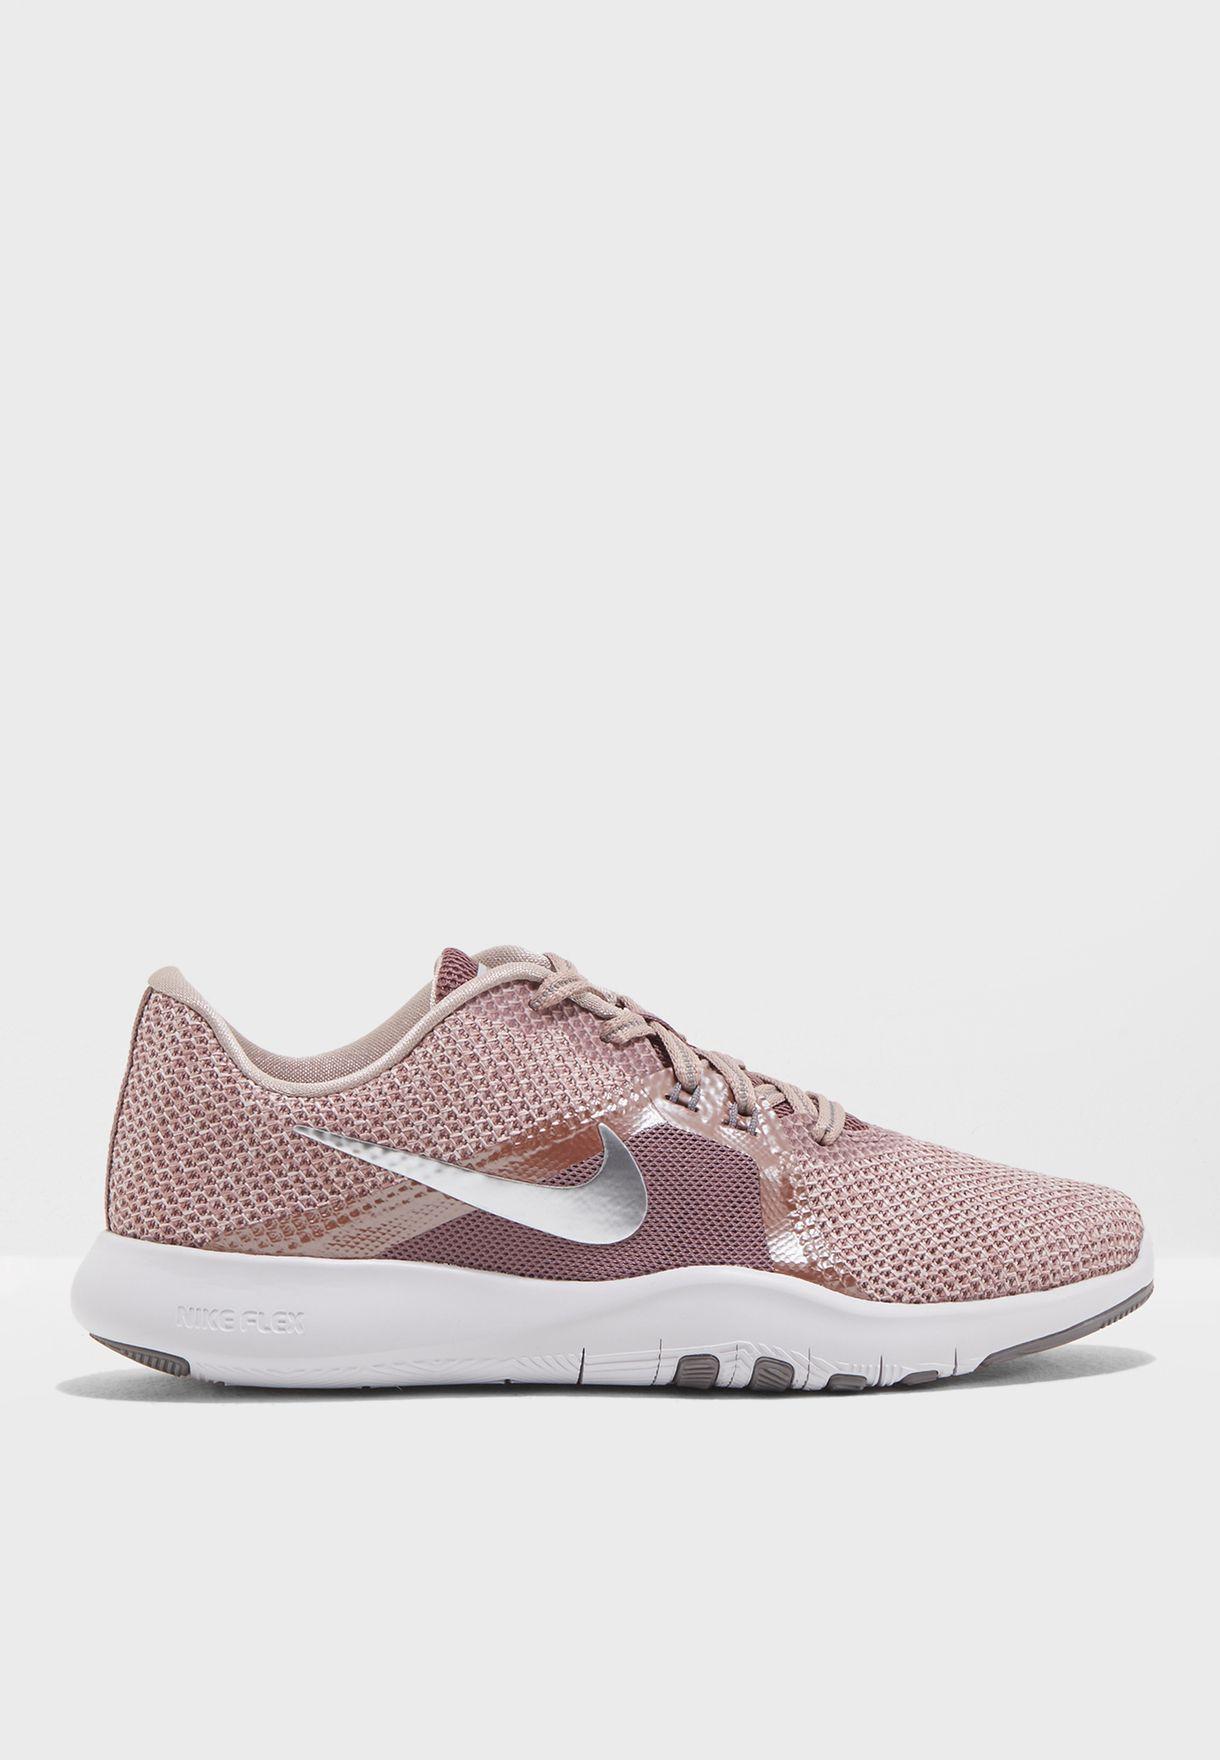 97618b1c2890 Shop Nike purple Flex Trainer 8 PRM 924340-200 for Women in UAE ...